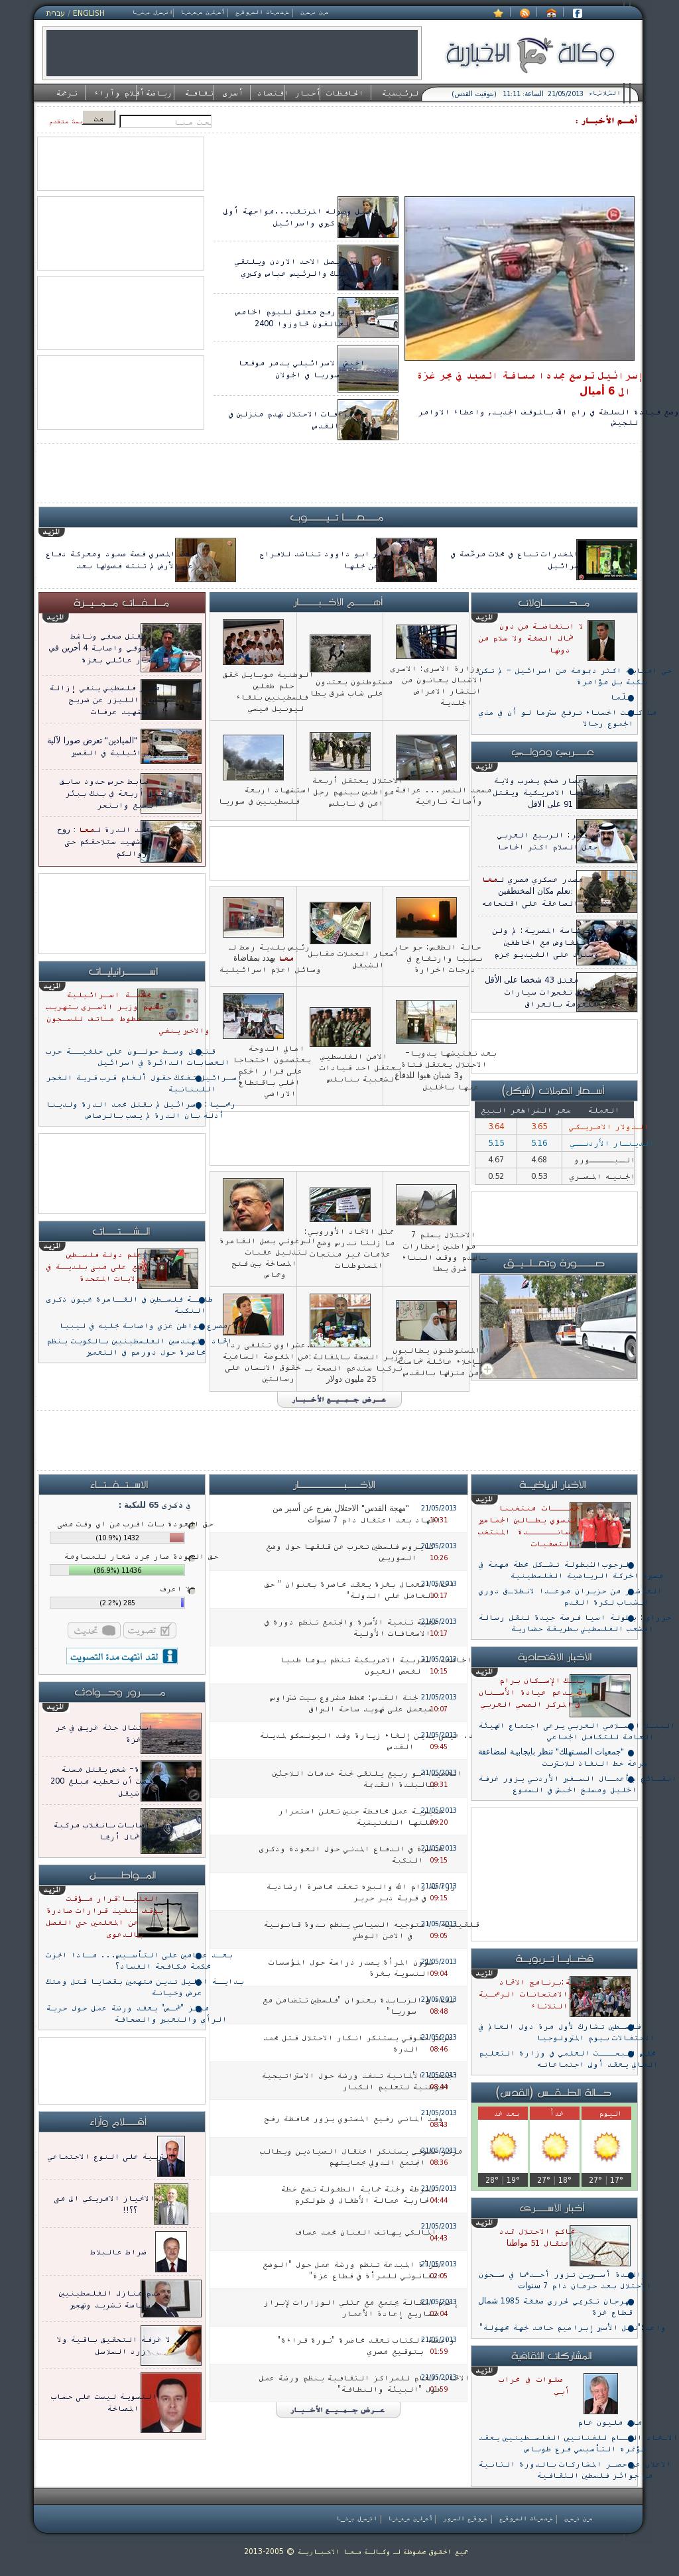 Ma'an News at Tuesday May 21, 2013, 8:11 a.m. UTC